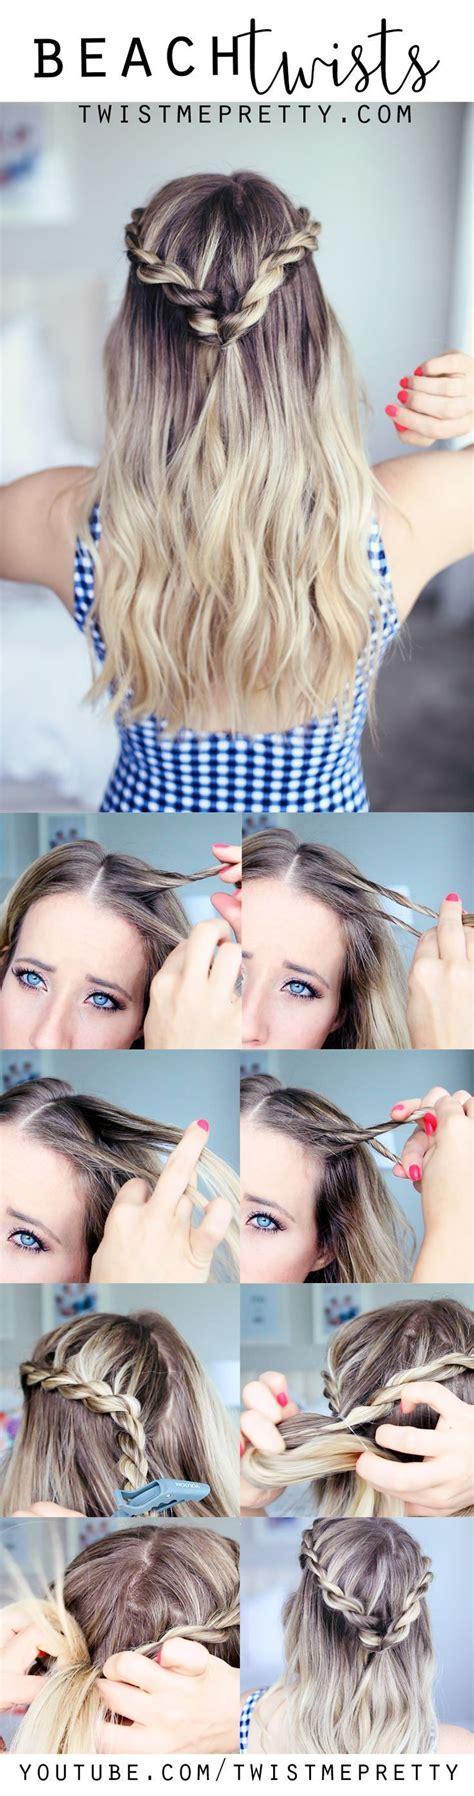 quicken easy hairstyles for school best 25 easy hairstyles ideas on hairstyles for school hairstyles